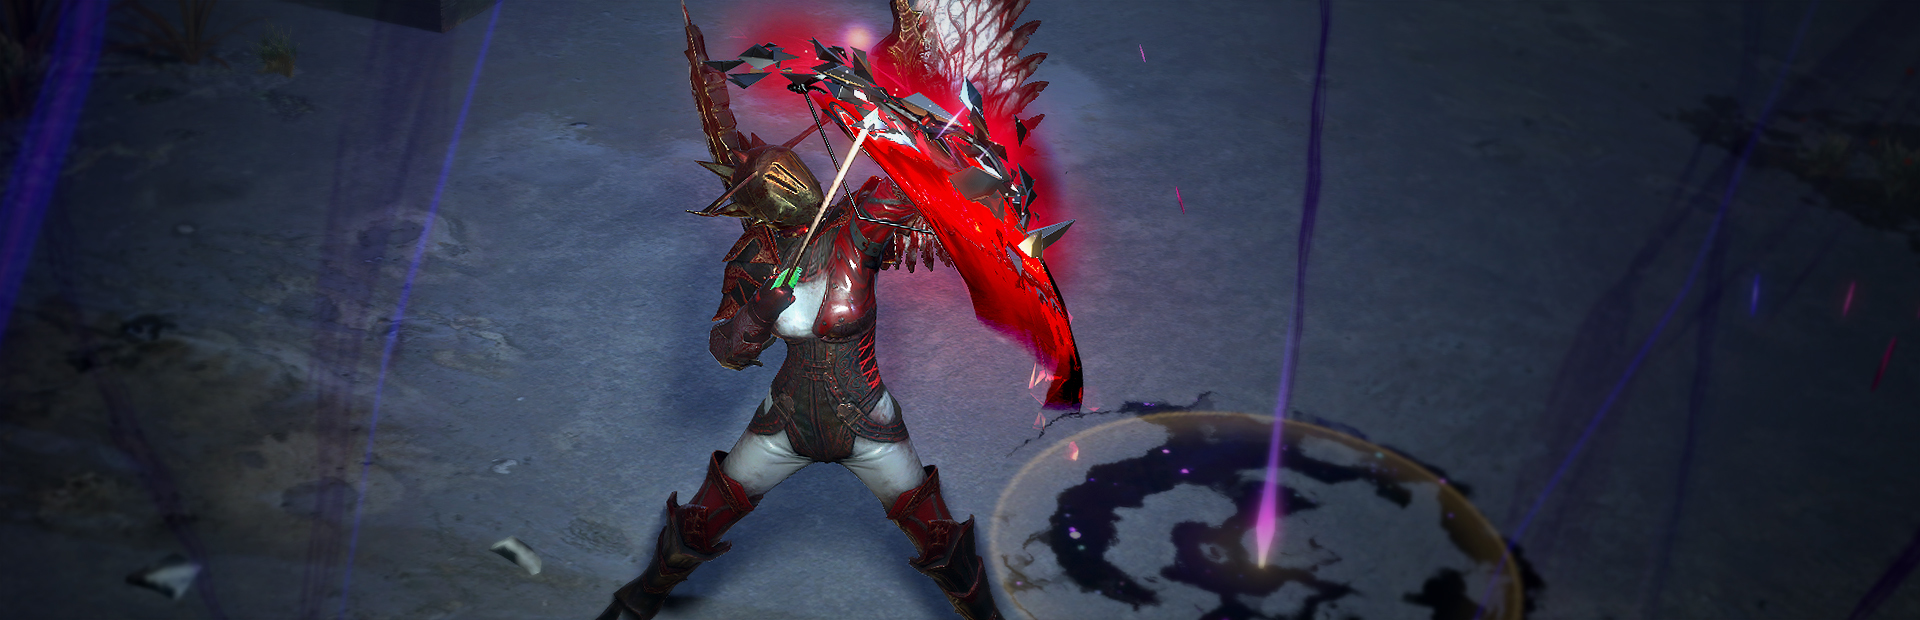 Communauté Steam :: Path of Exile